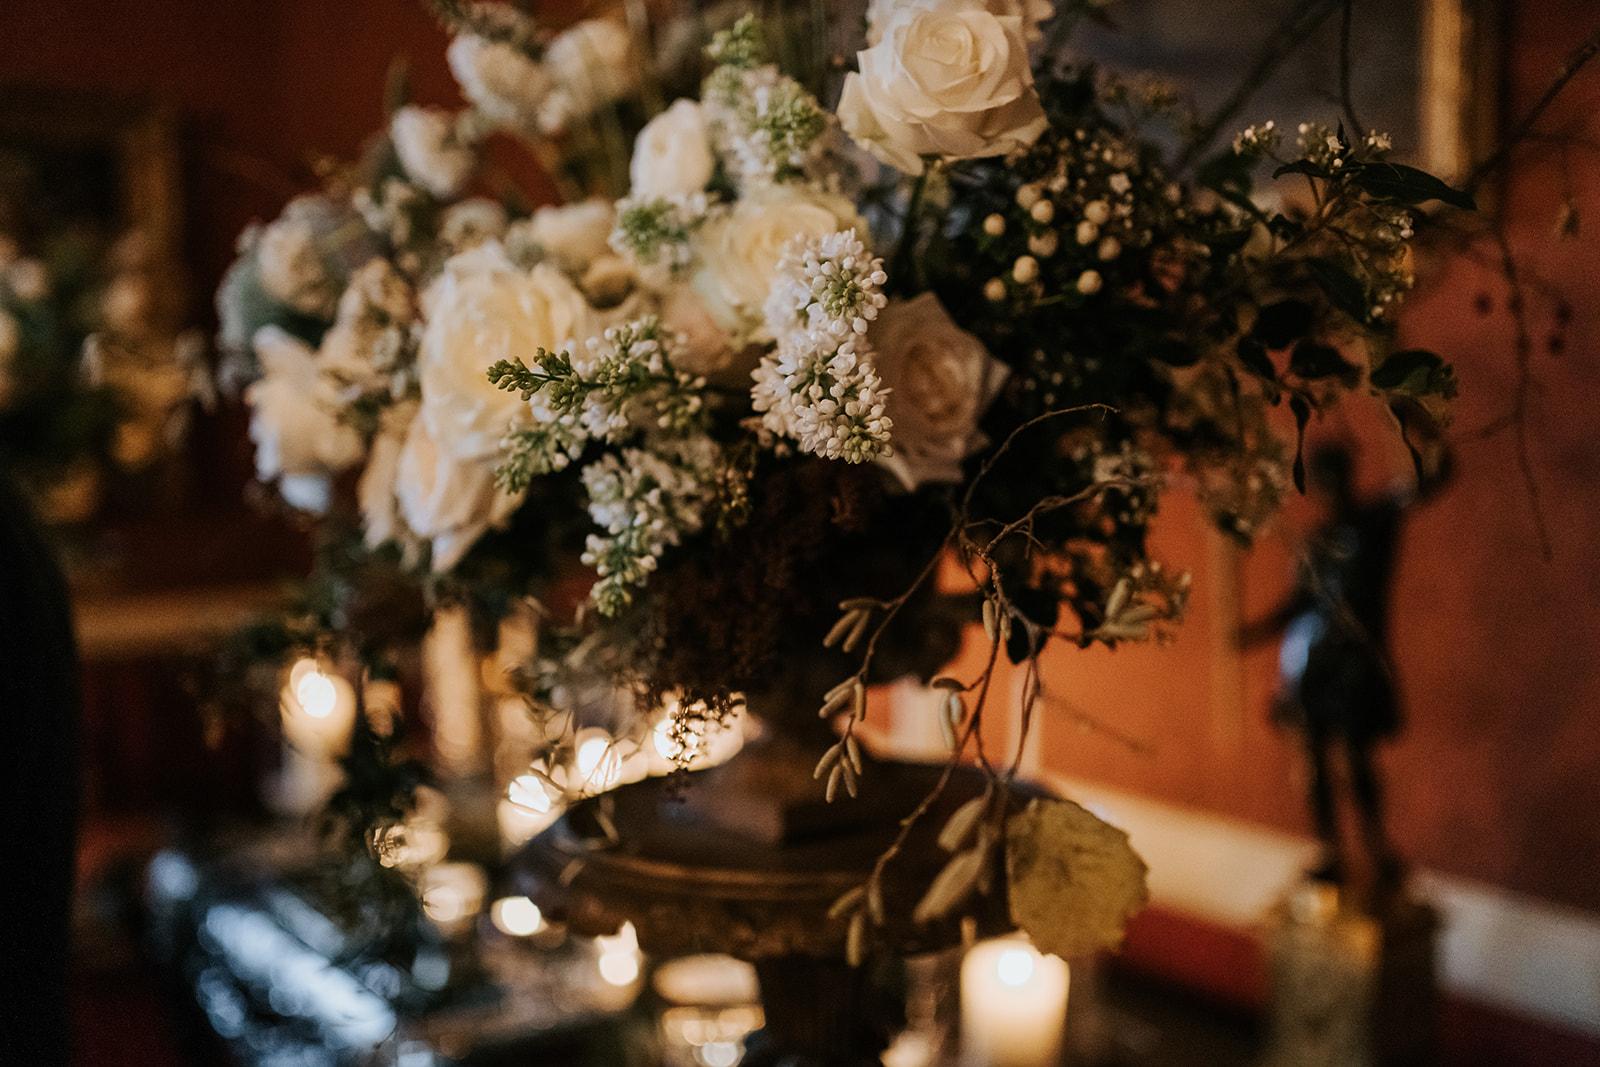 Florals - Moss & Stone Floral Design | Image - Damien Milan